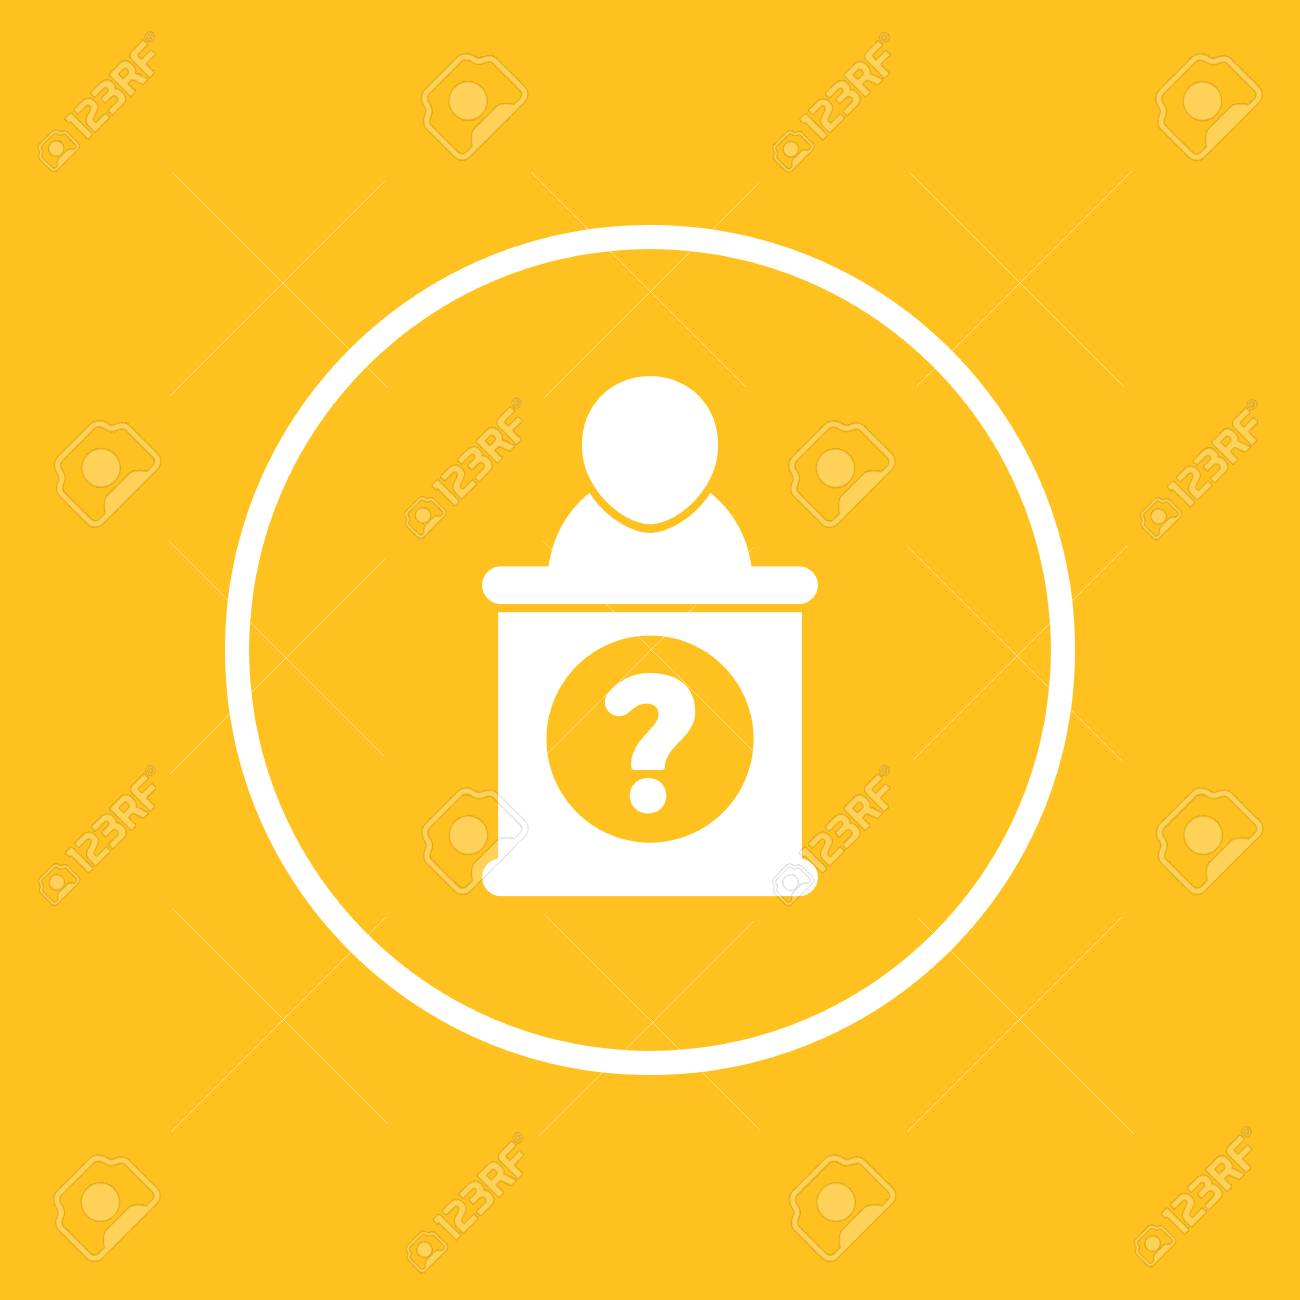 Information Desk Icon In Circle Vector Illustration